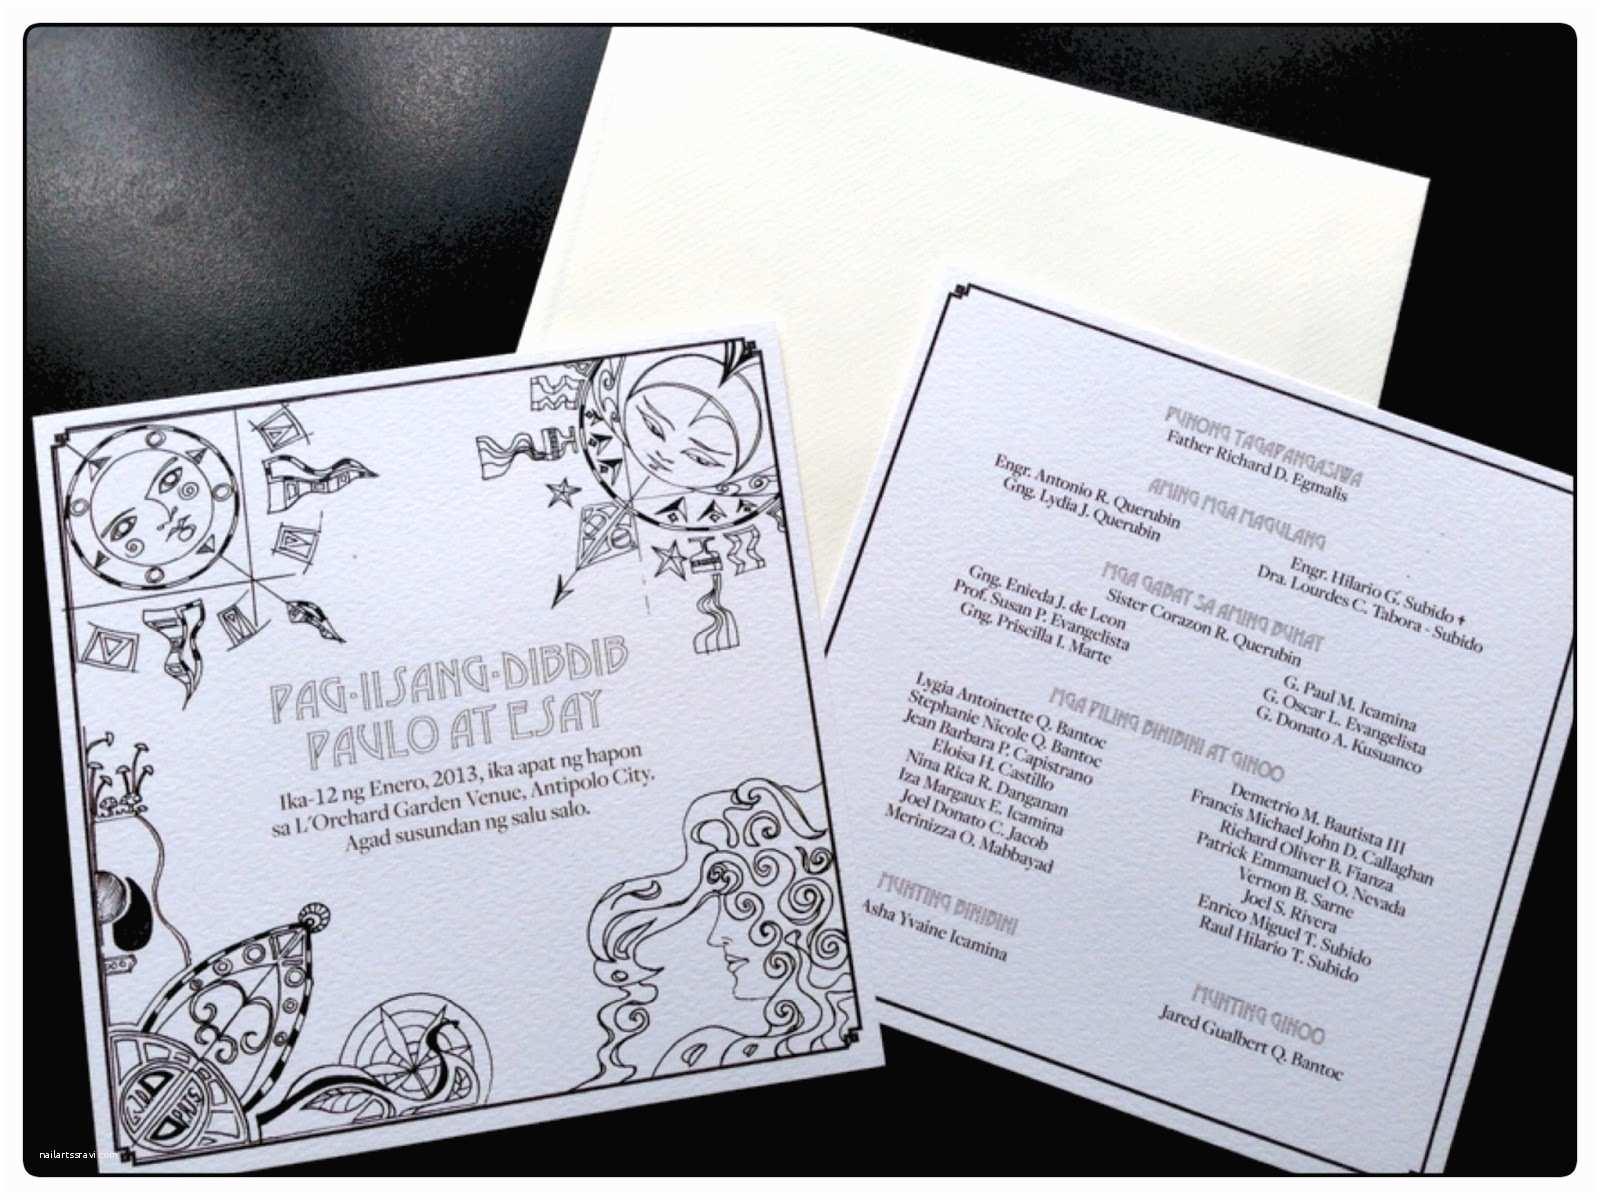 Filipino Wedding Invitation Sample 18 Inspirational Filipino Wedding Invitation Free